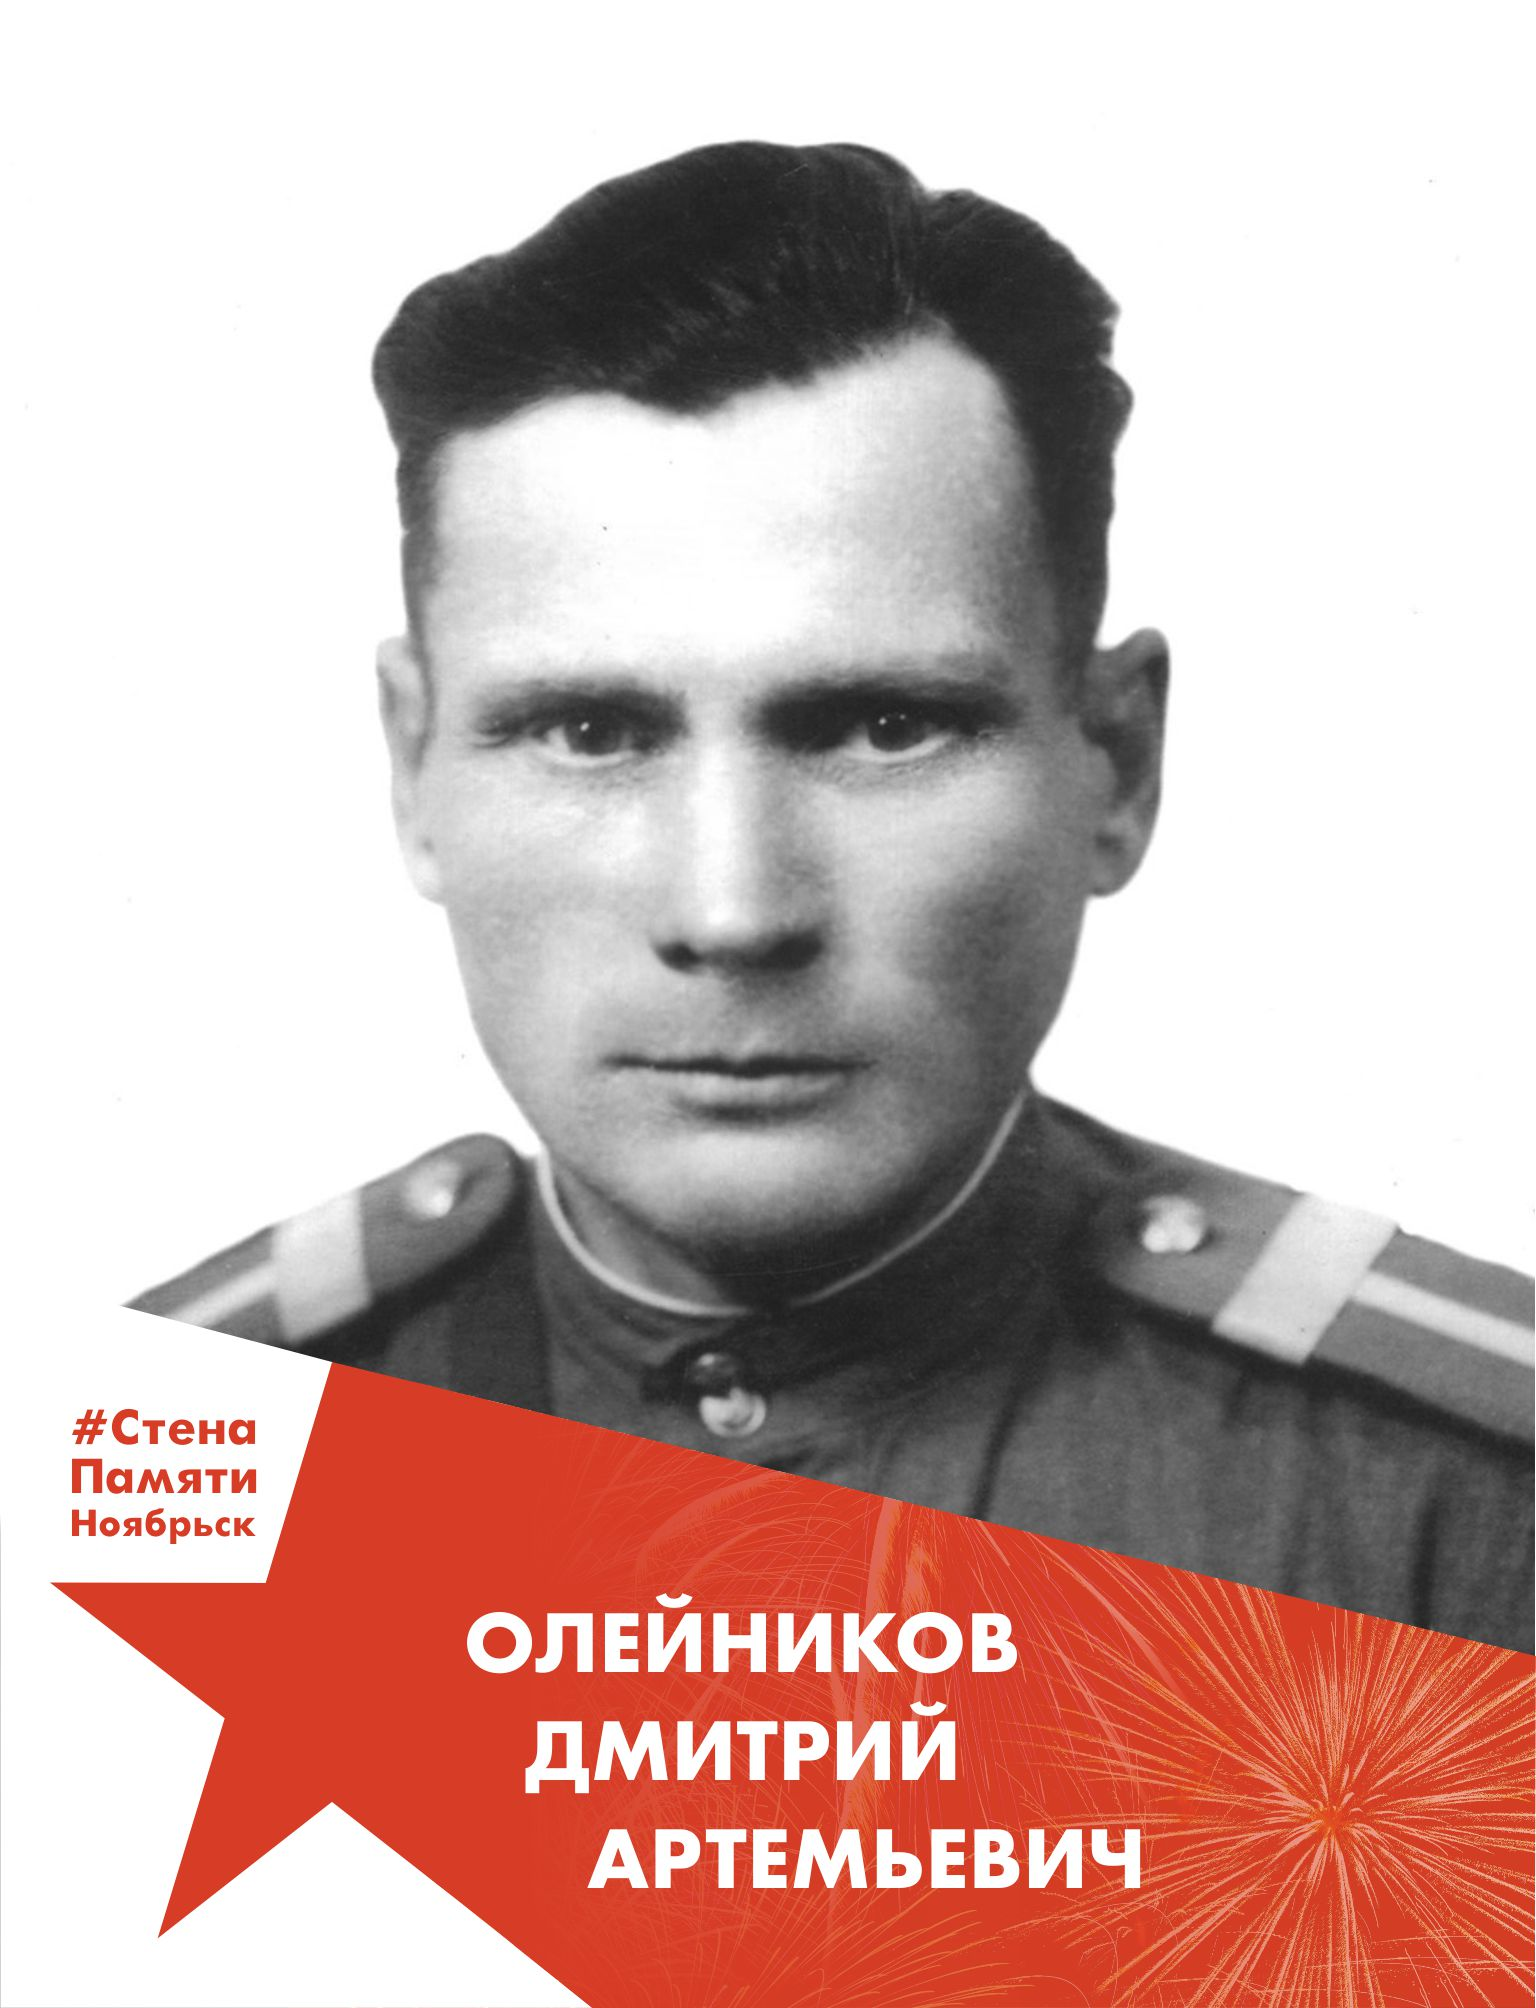 Олейников Дмитрий Артемьевич